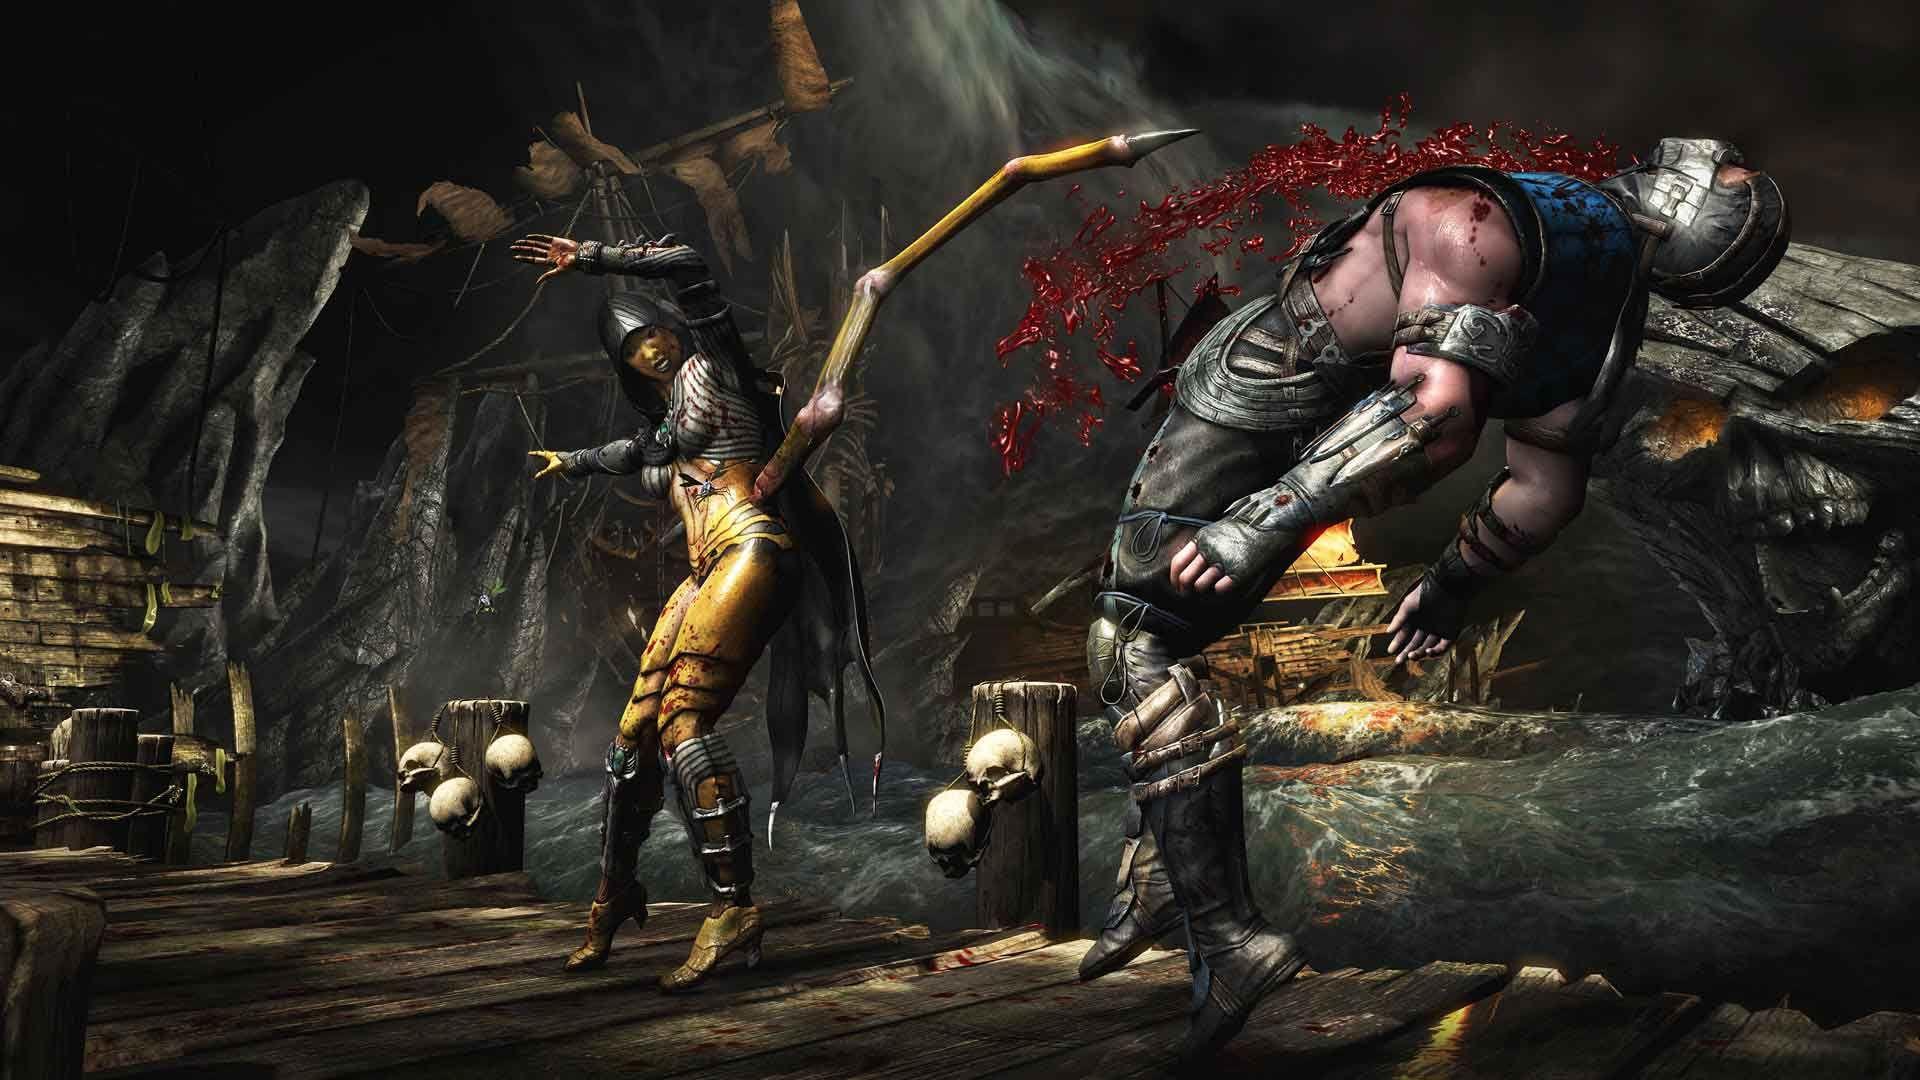 yazi_81205_1 Mortal Kombat X - İnceleme